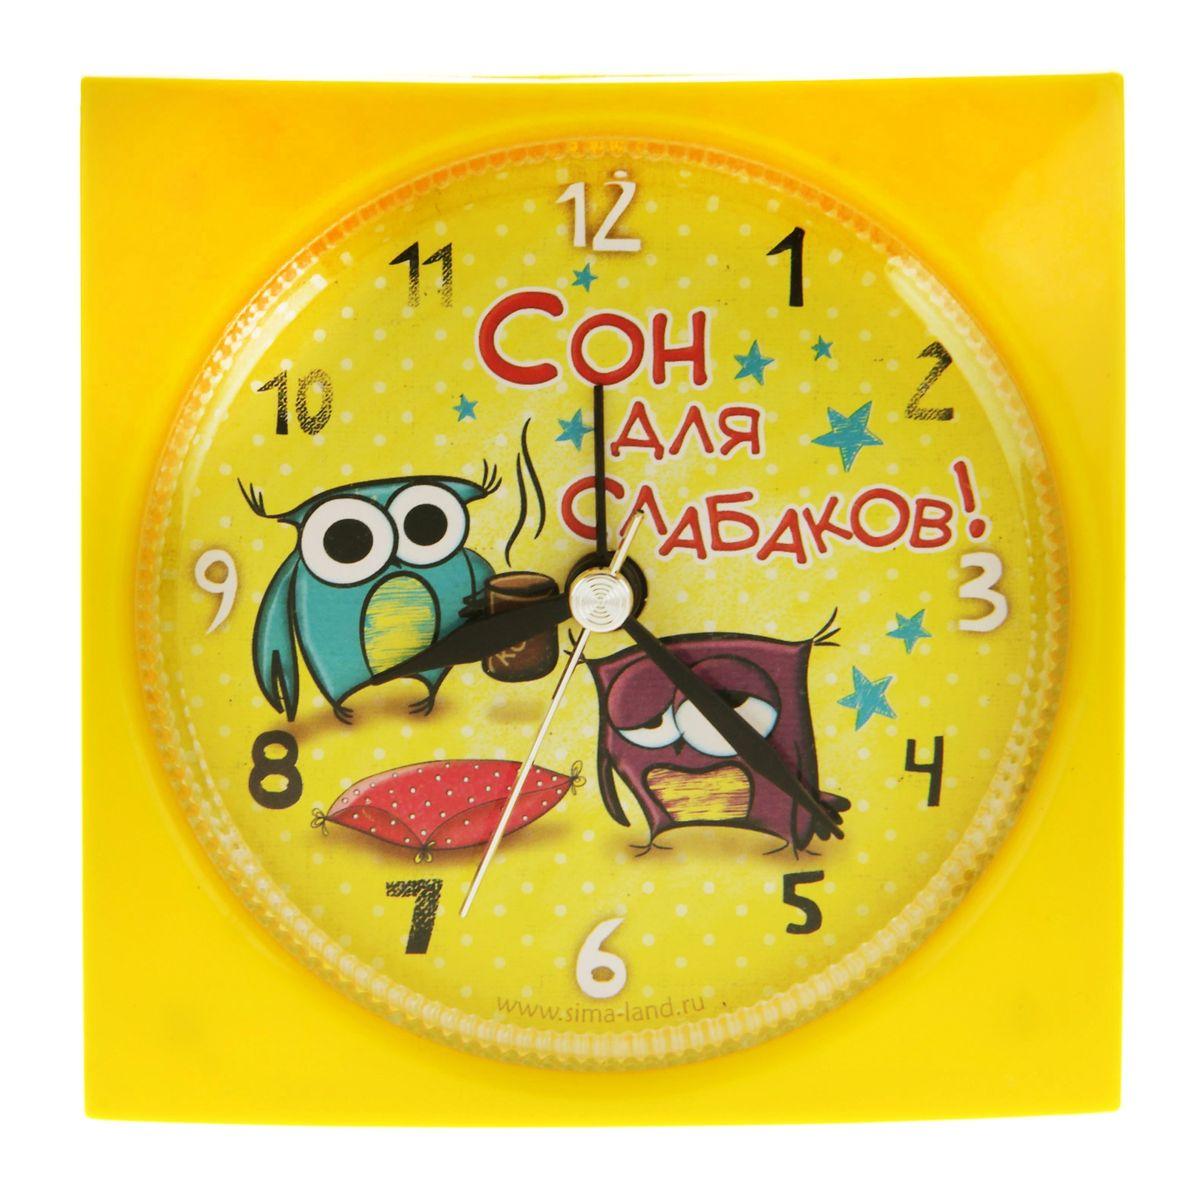 Часы-будильник квадрат Сон для слабаков, 9 см 845896MRC 4142 schwarzПластик